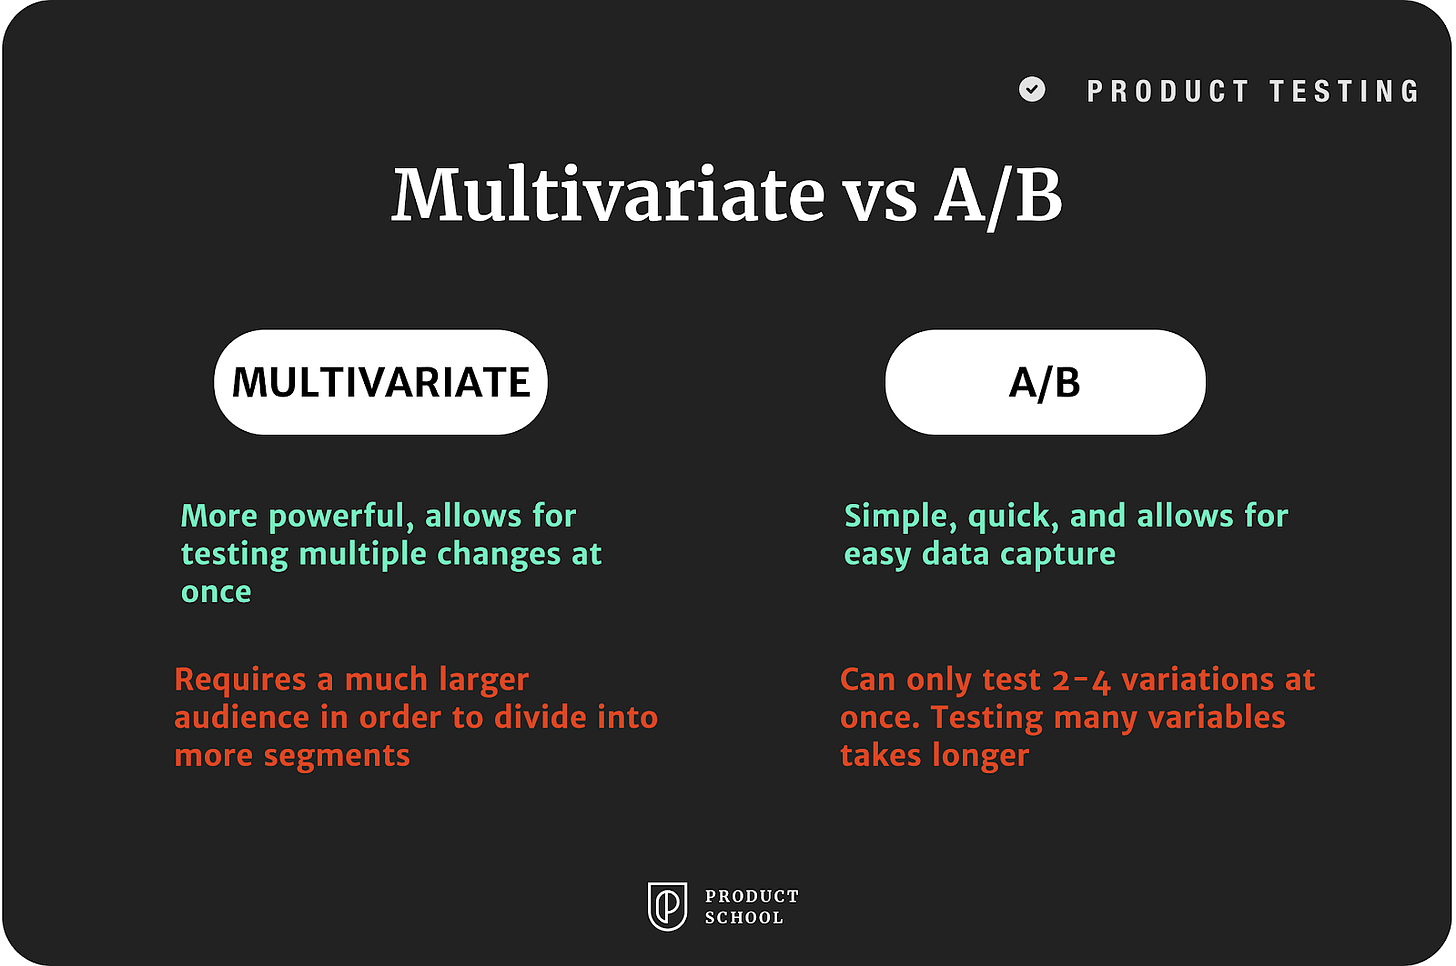 Multivariate vs A/B testing